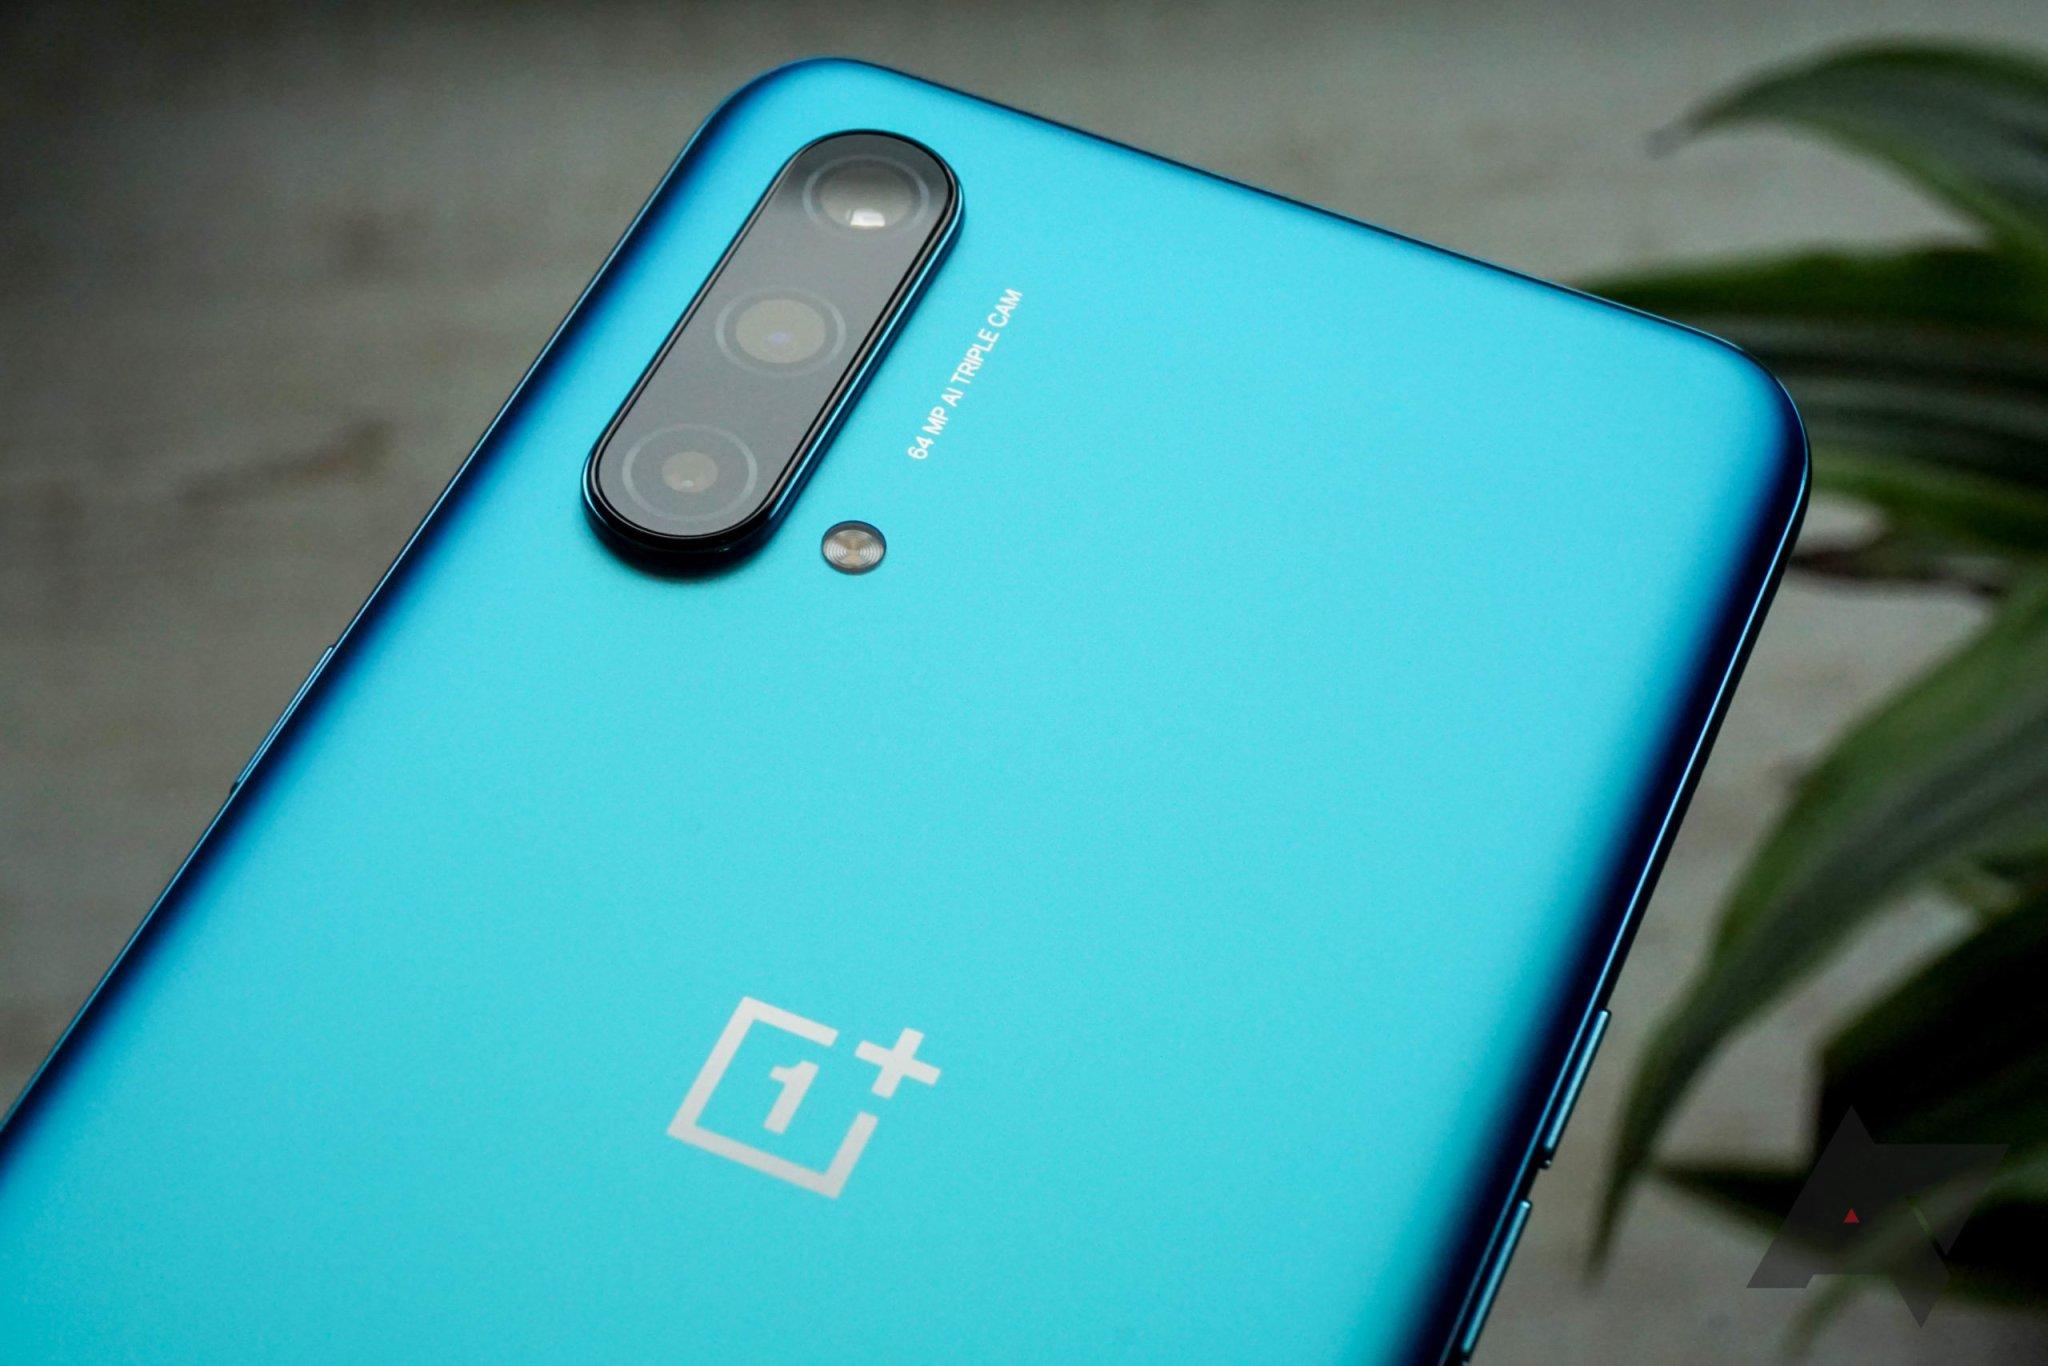 OnePlus needs to act more like Samsung